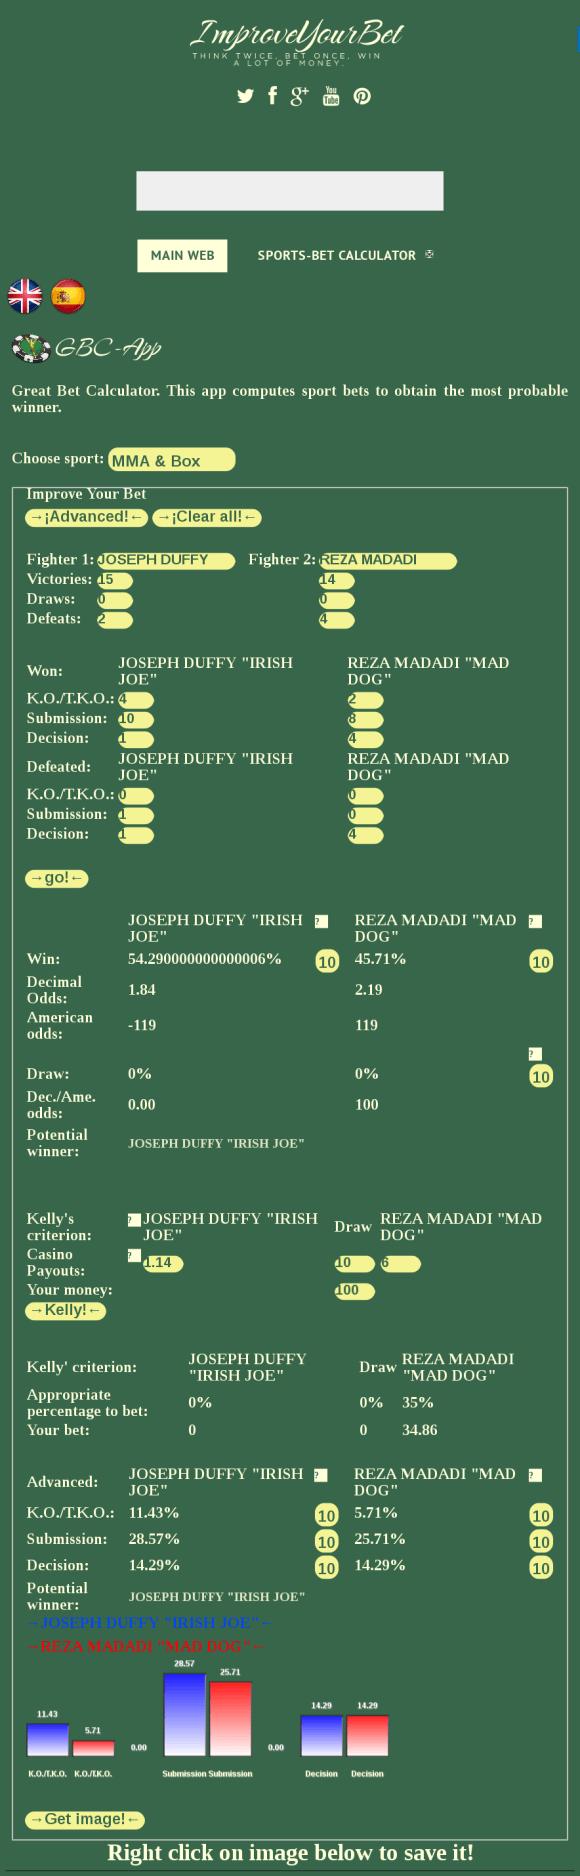 Ufc Fight Night 107 Forecast Predictions And Picks Joseph Duffy Irish Joe Vs Reza Madadi Mad Dog Ufc Fight Night Ufc Ufc Betting